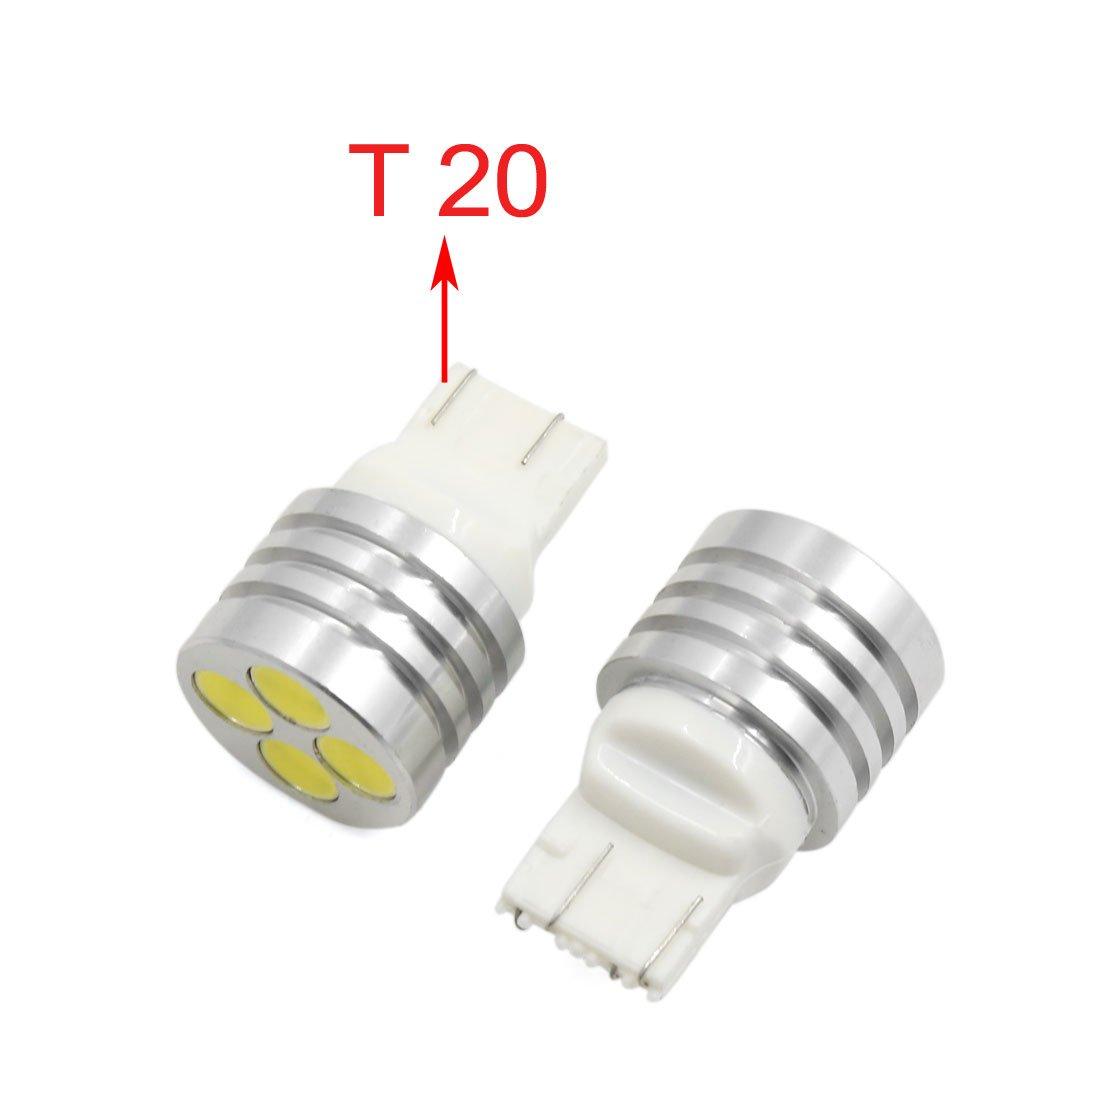 T20 7440 7443 Bianco Caldo 4 LED COB Backup Freno retromarcia Lampadina Luce 6000K sourcing map 2pz